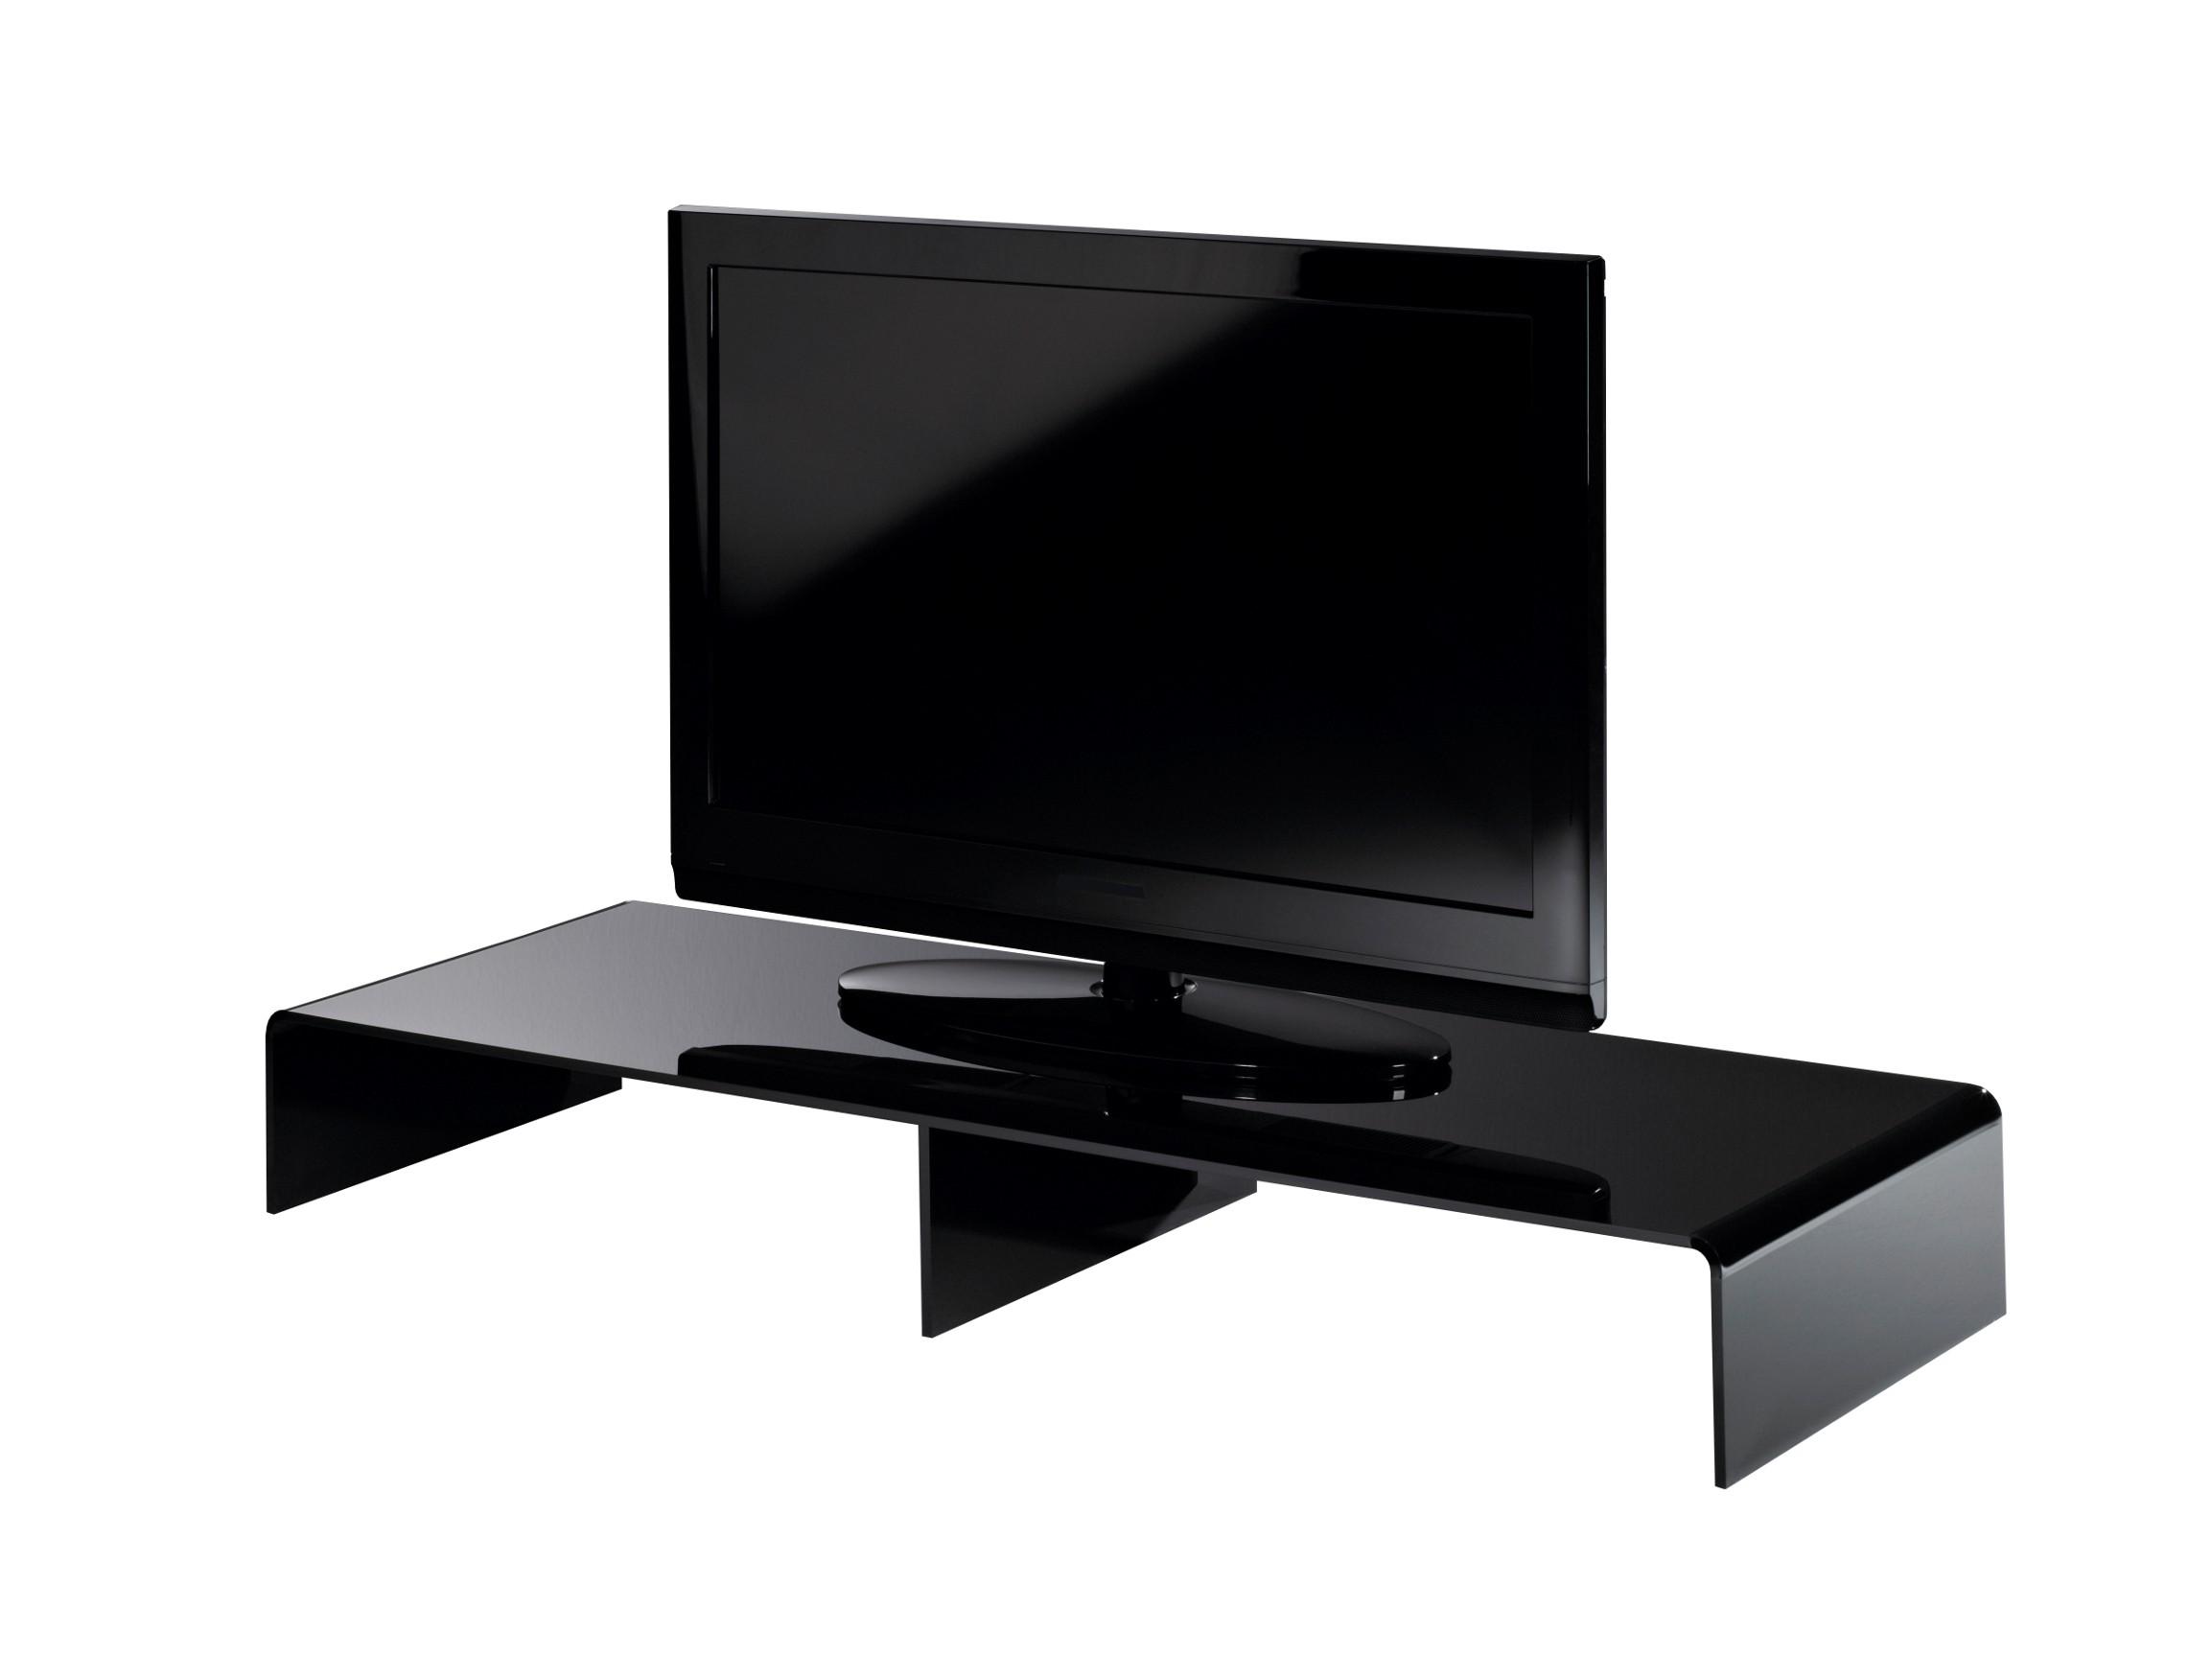 tv konsole new york breite 110 cm acrylglas schwarz wohnen tv m bel tv lowboards. Black Bedroom Furniture Sets. Home Design Ideas